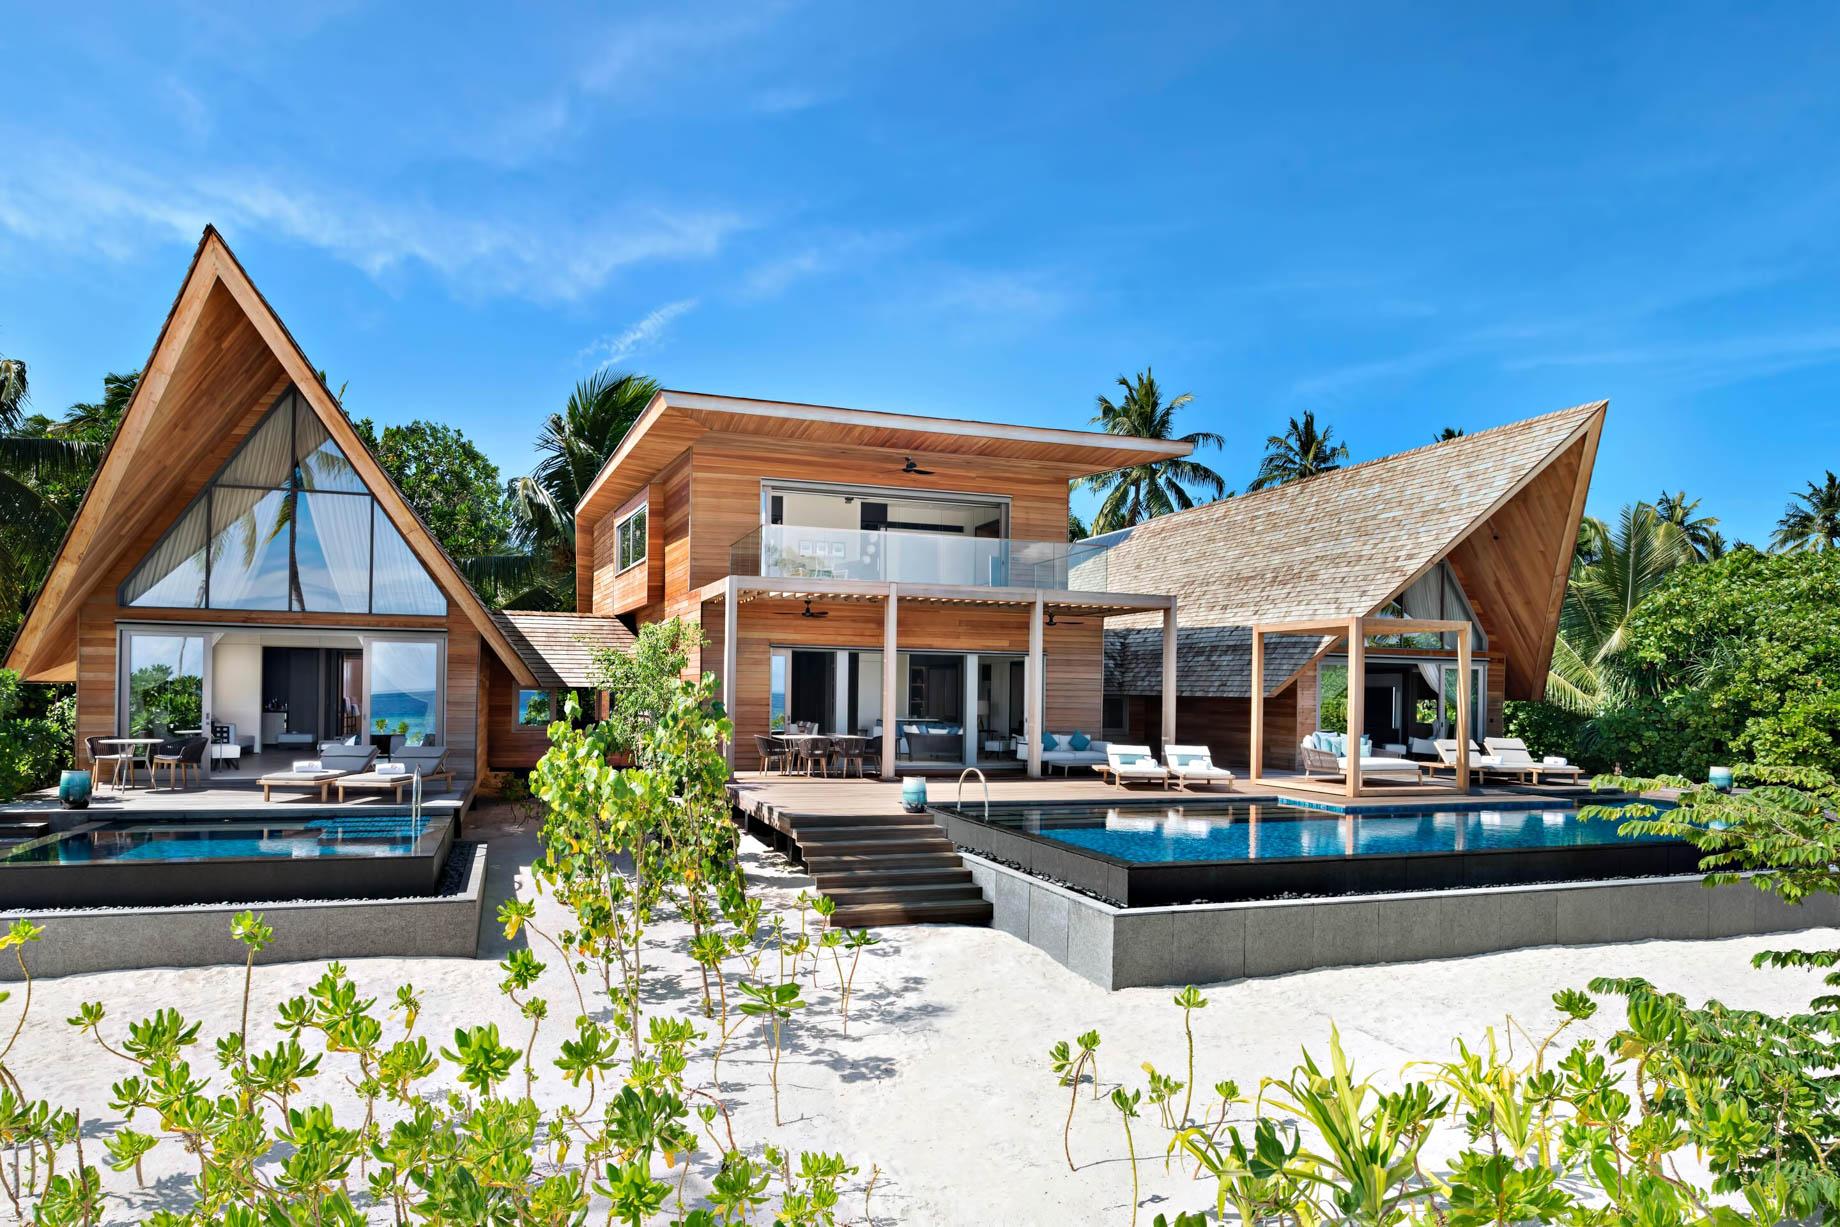 The St. Regis Maldives Vommuli Luxury Resort - Dhaalu Atoll, Maldives - Caroline Astor Estate Exterior